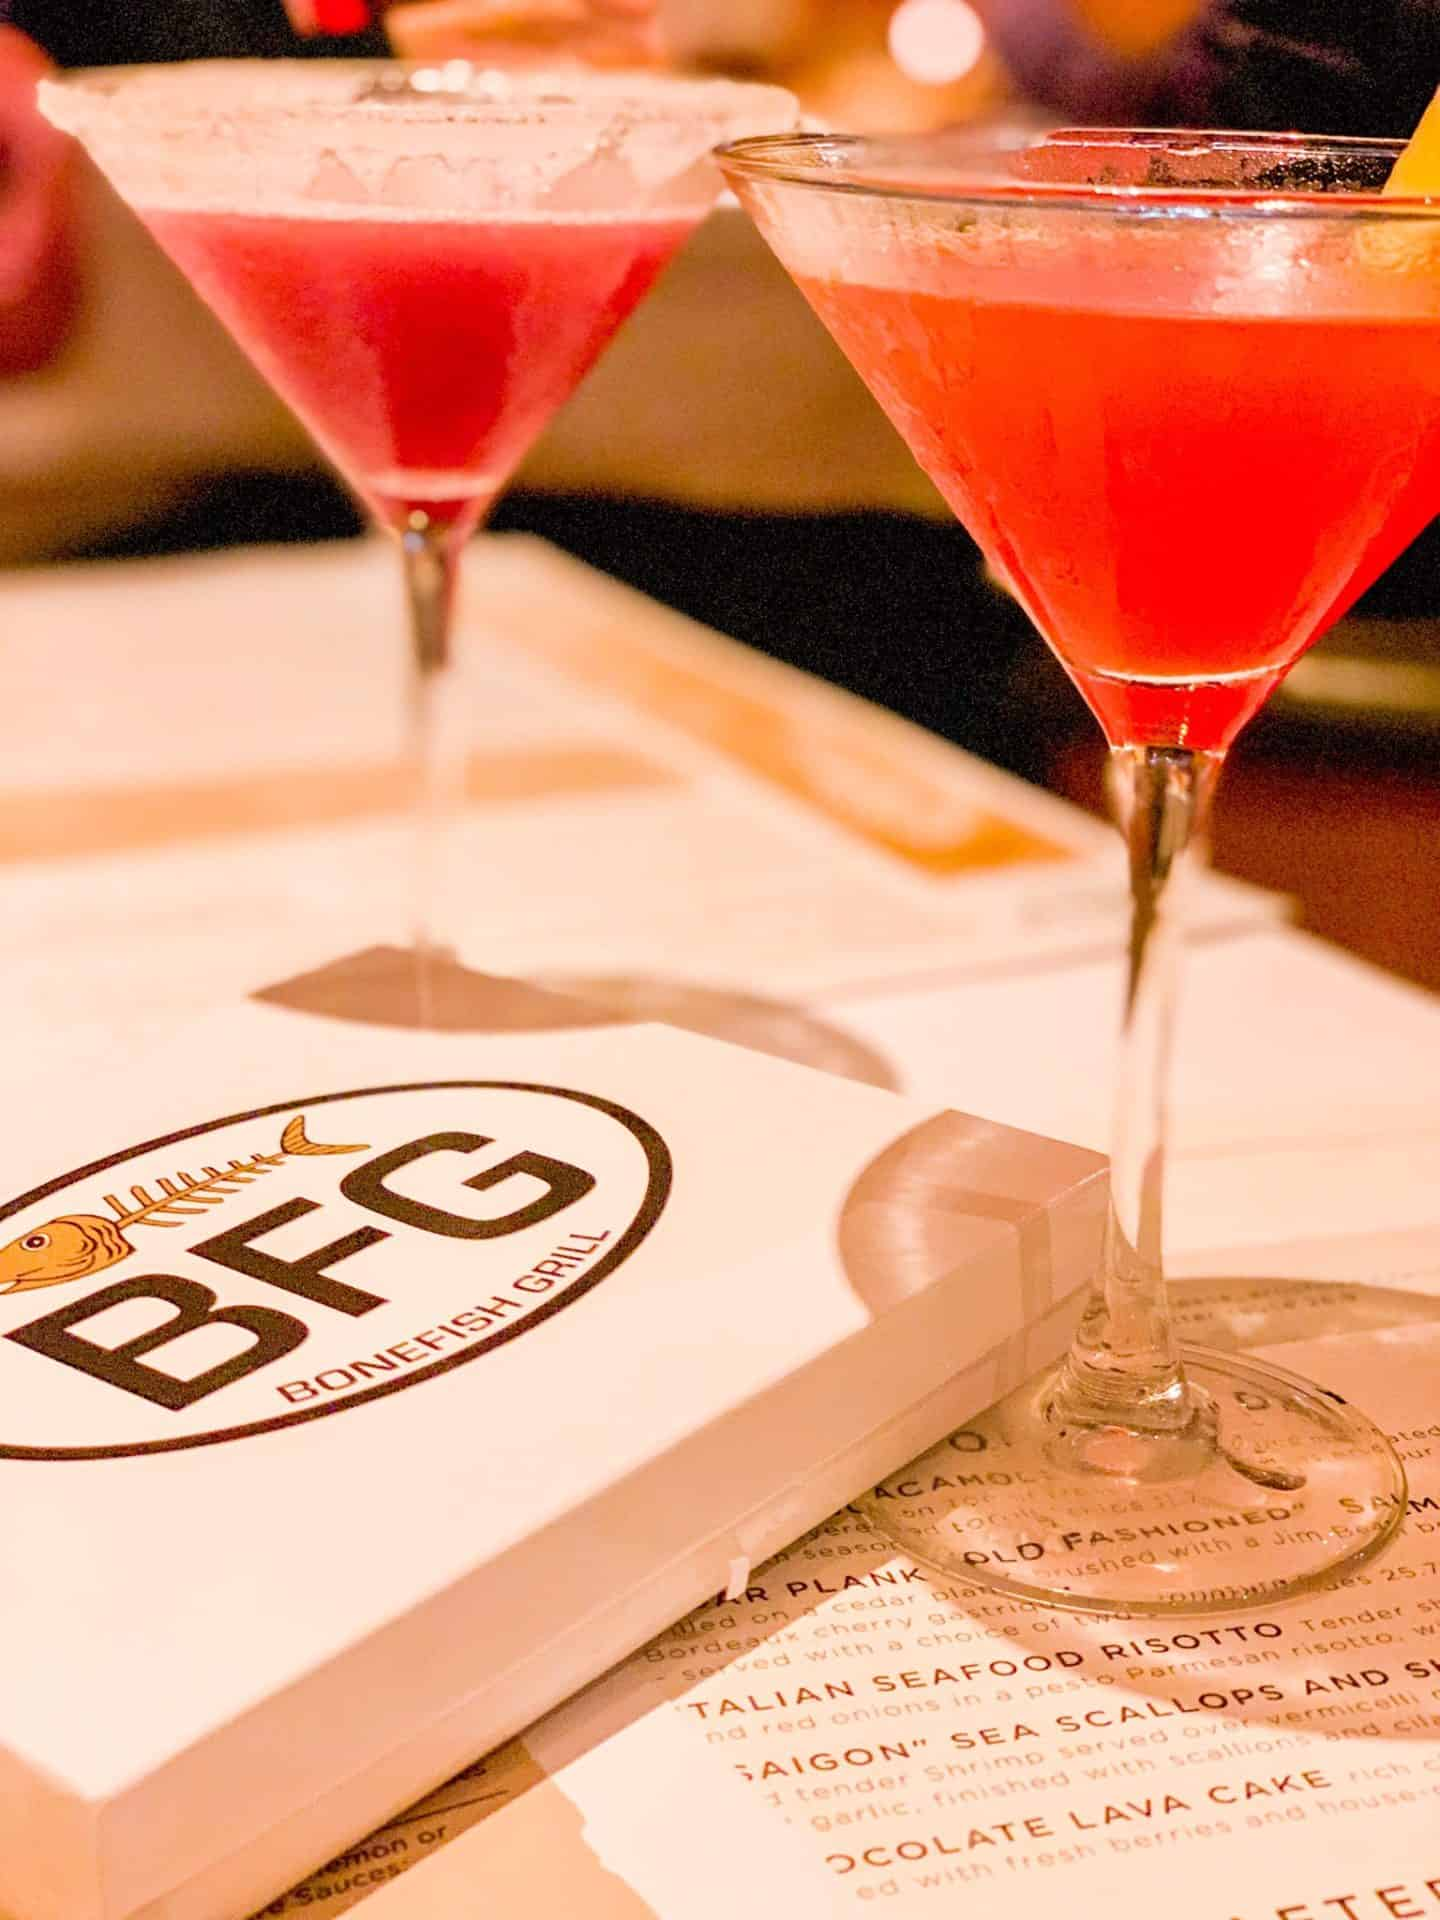 ShaundaNecole.com Our Valentine's Dinner At Bonefish Grill- Tropical Tiki Martini